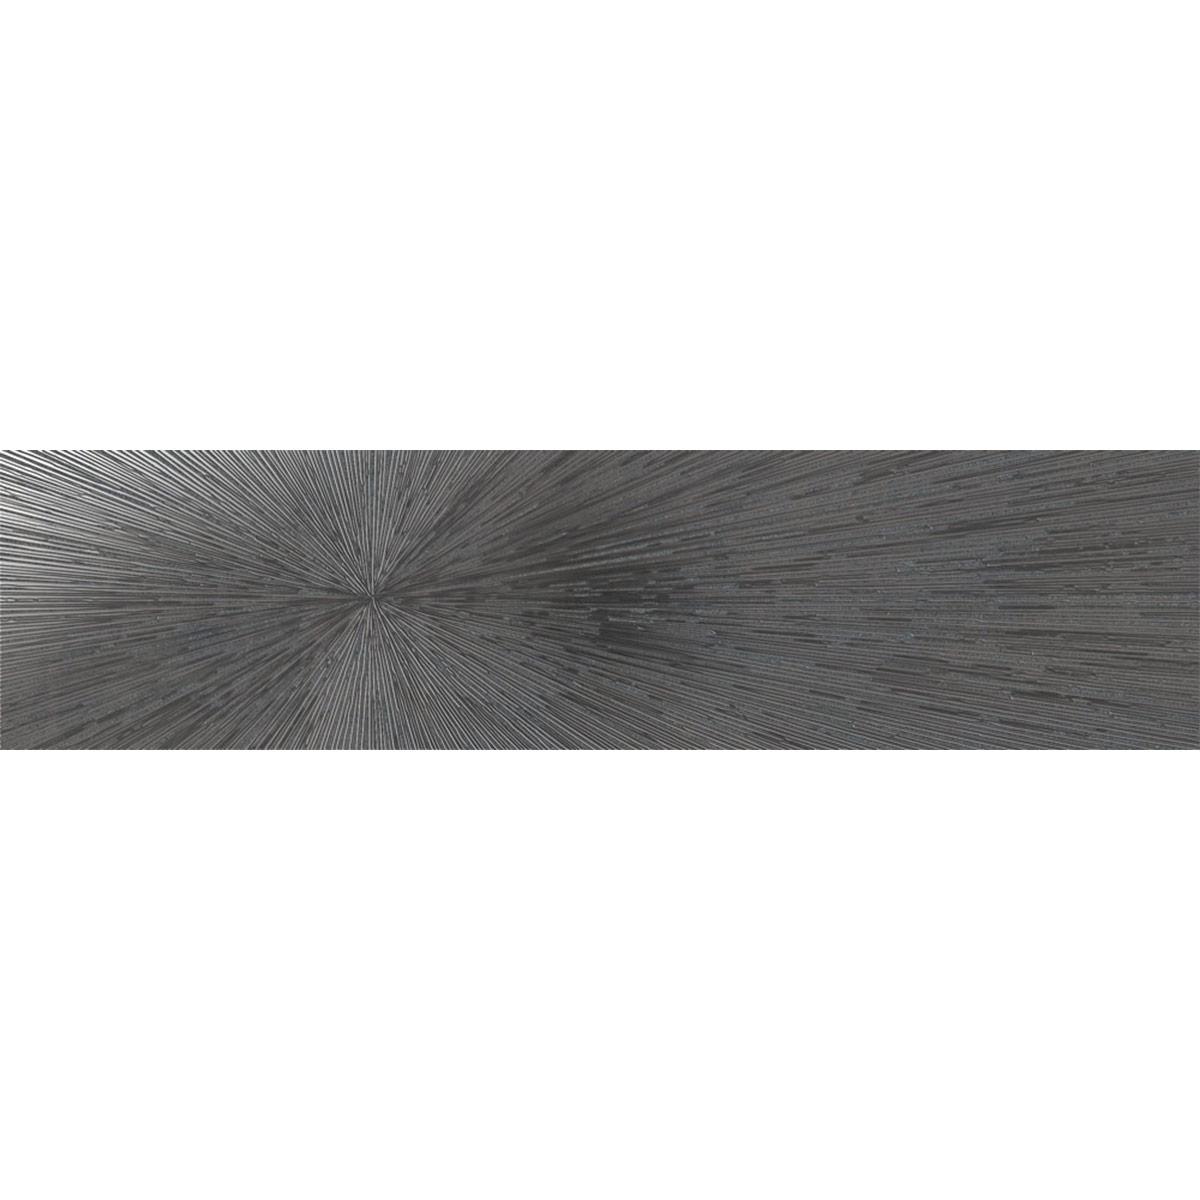 IONIC IMPACT STEEL DECOR D00192A P1